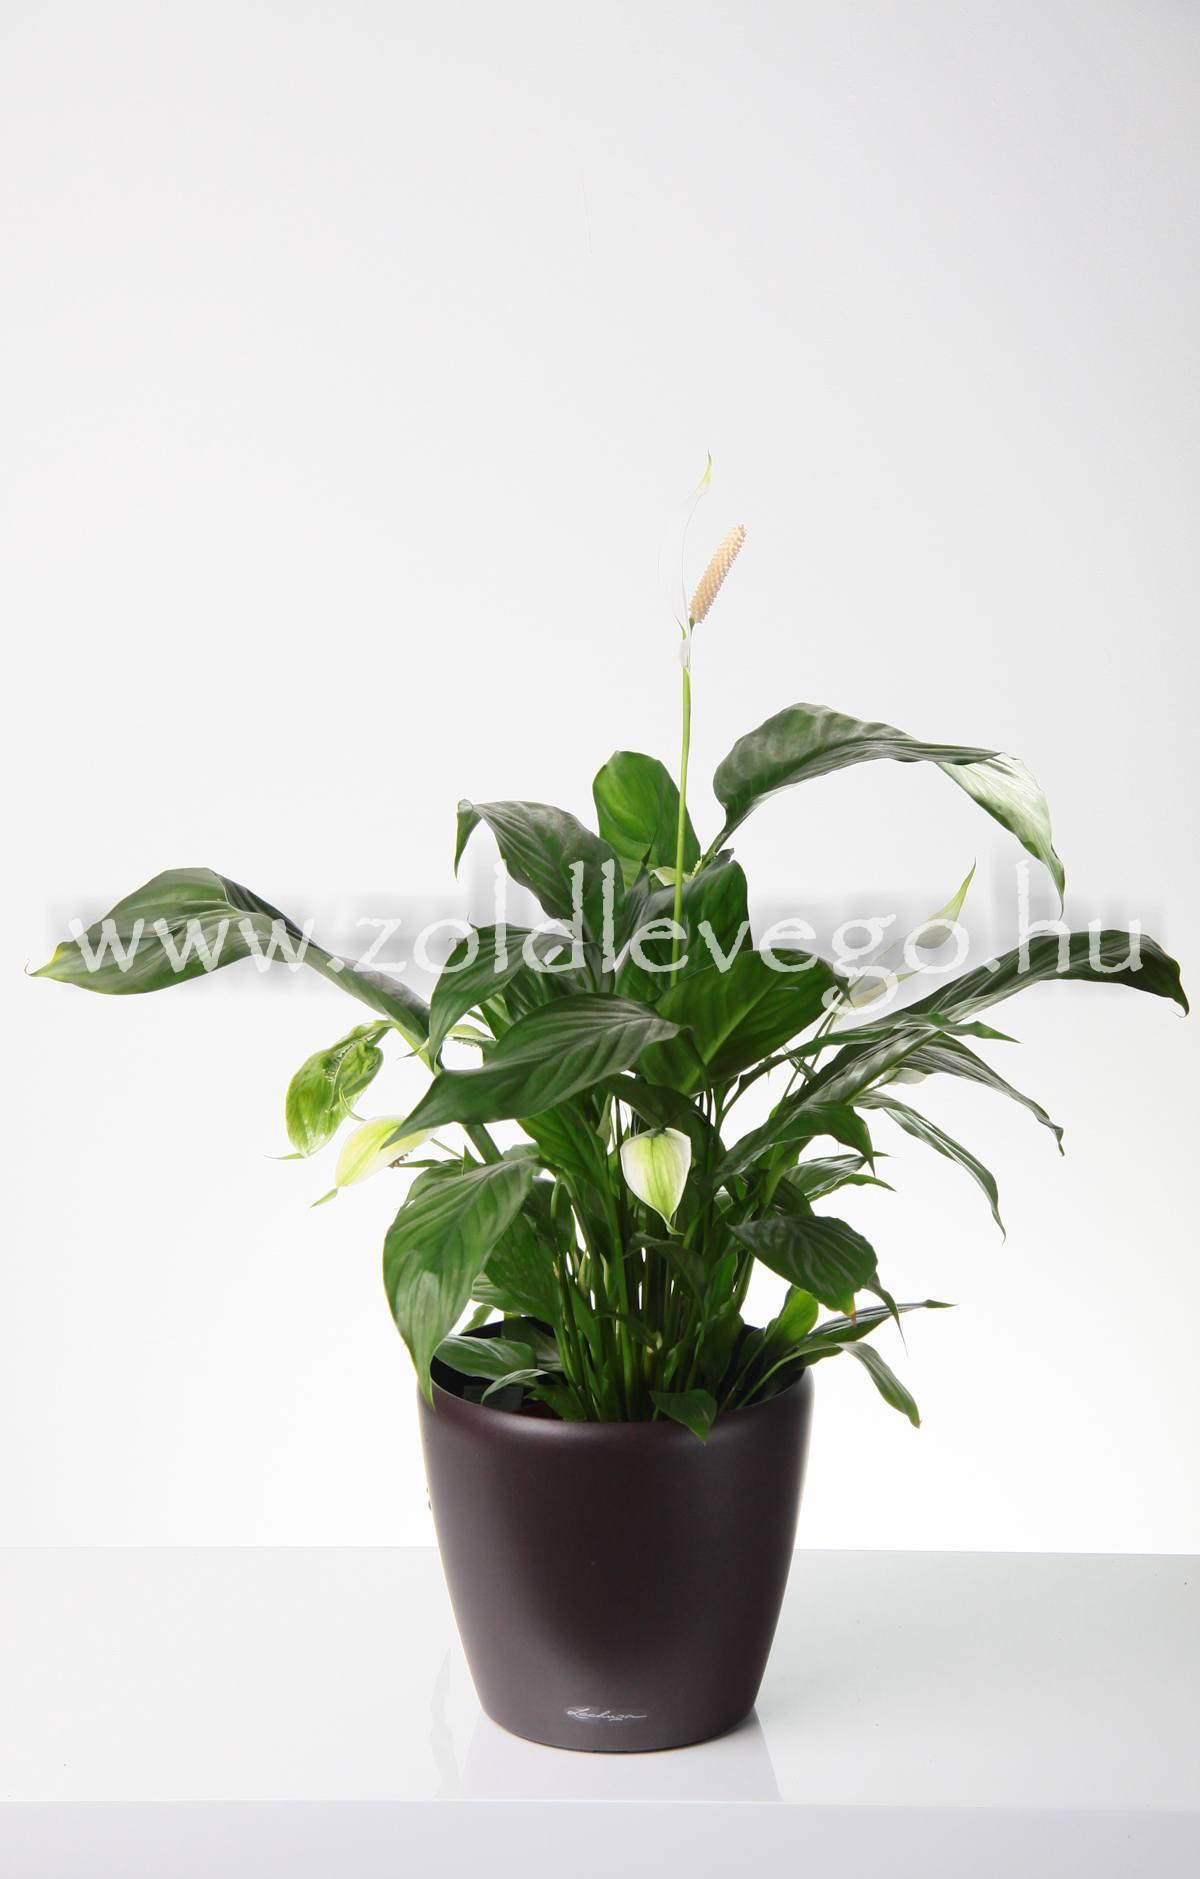 Spatiphyllum spp